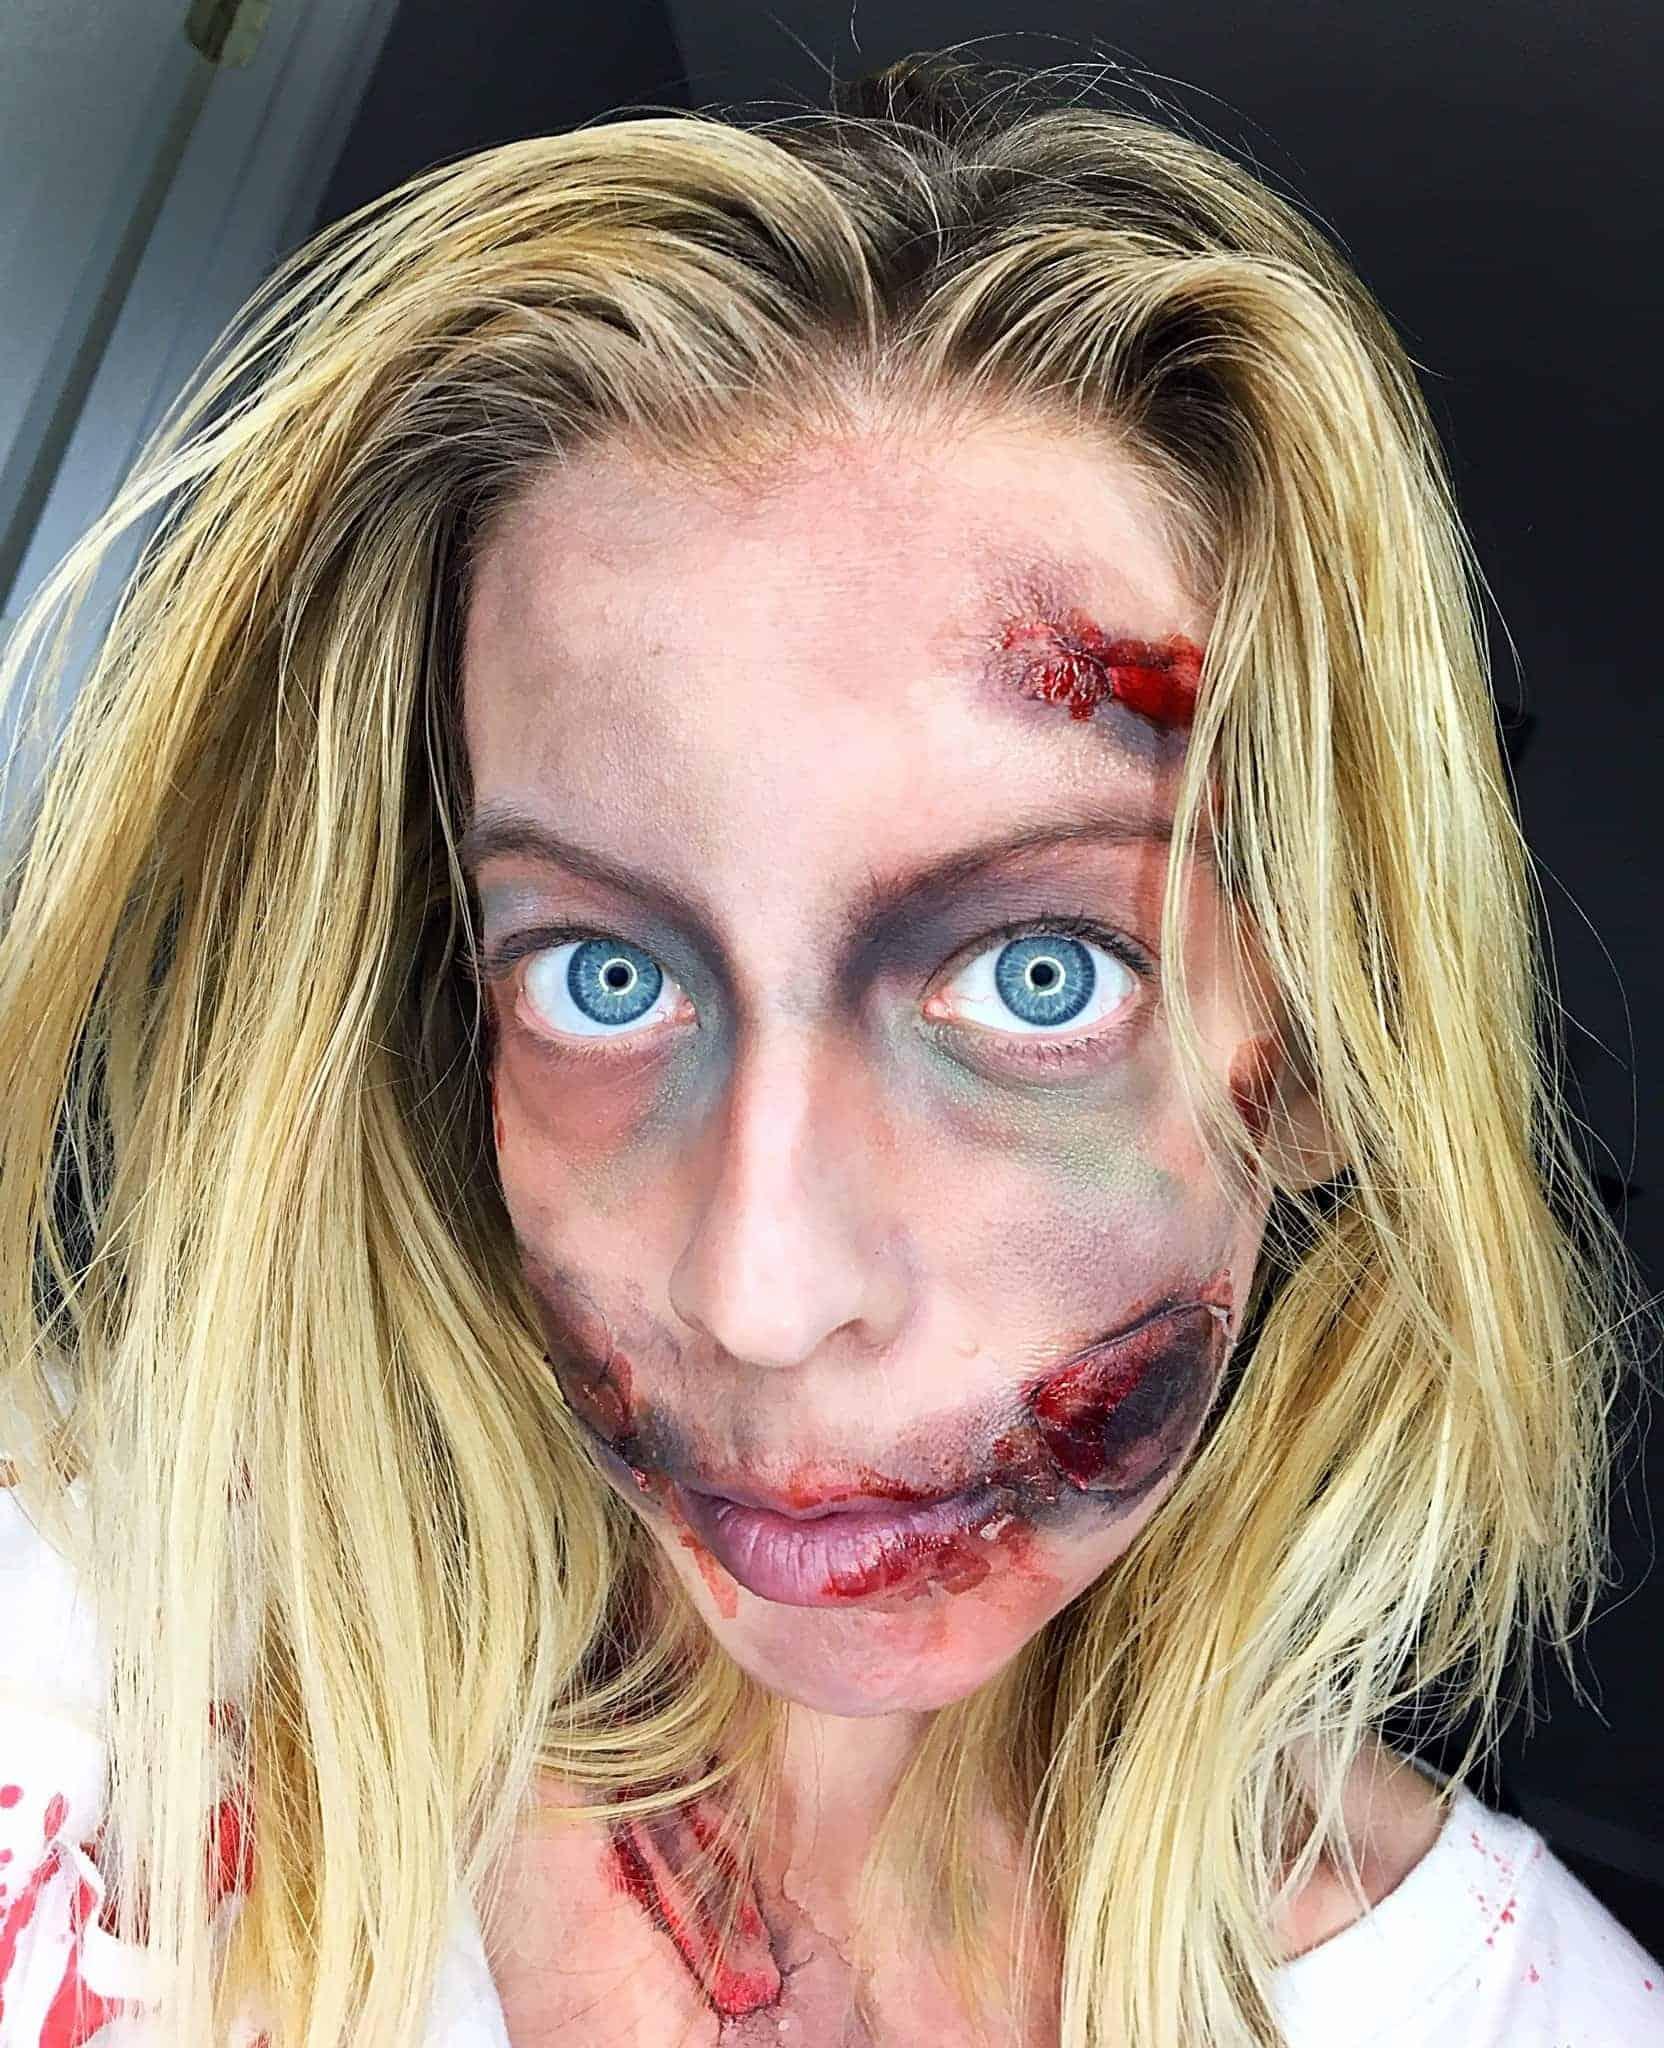 halloween tutorial-diy zombie makeup and costume - kindly unspoken